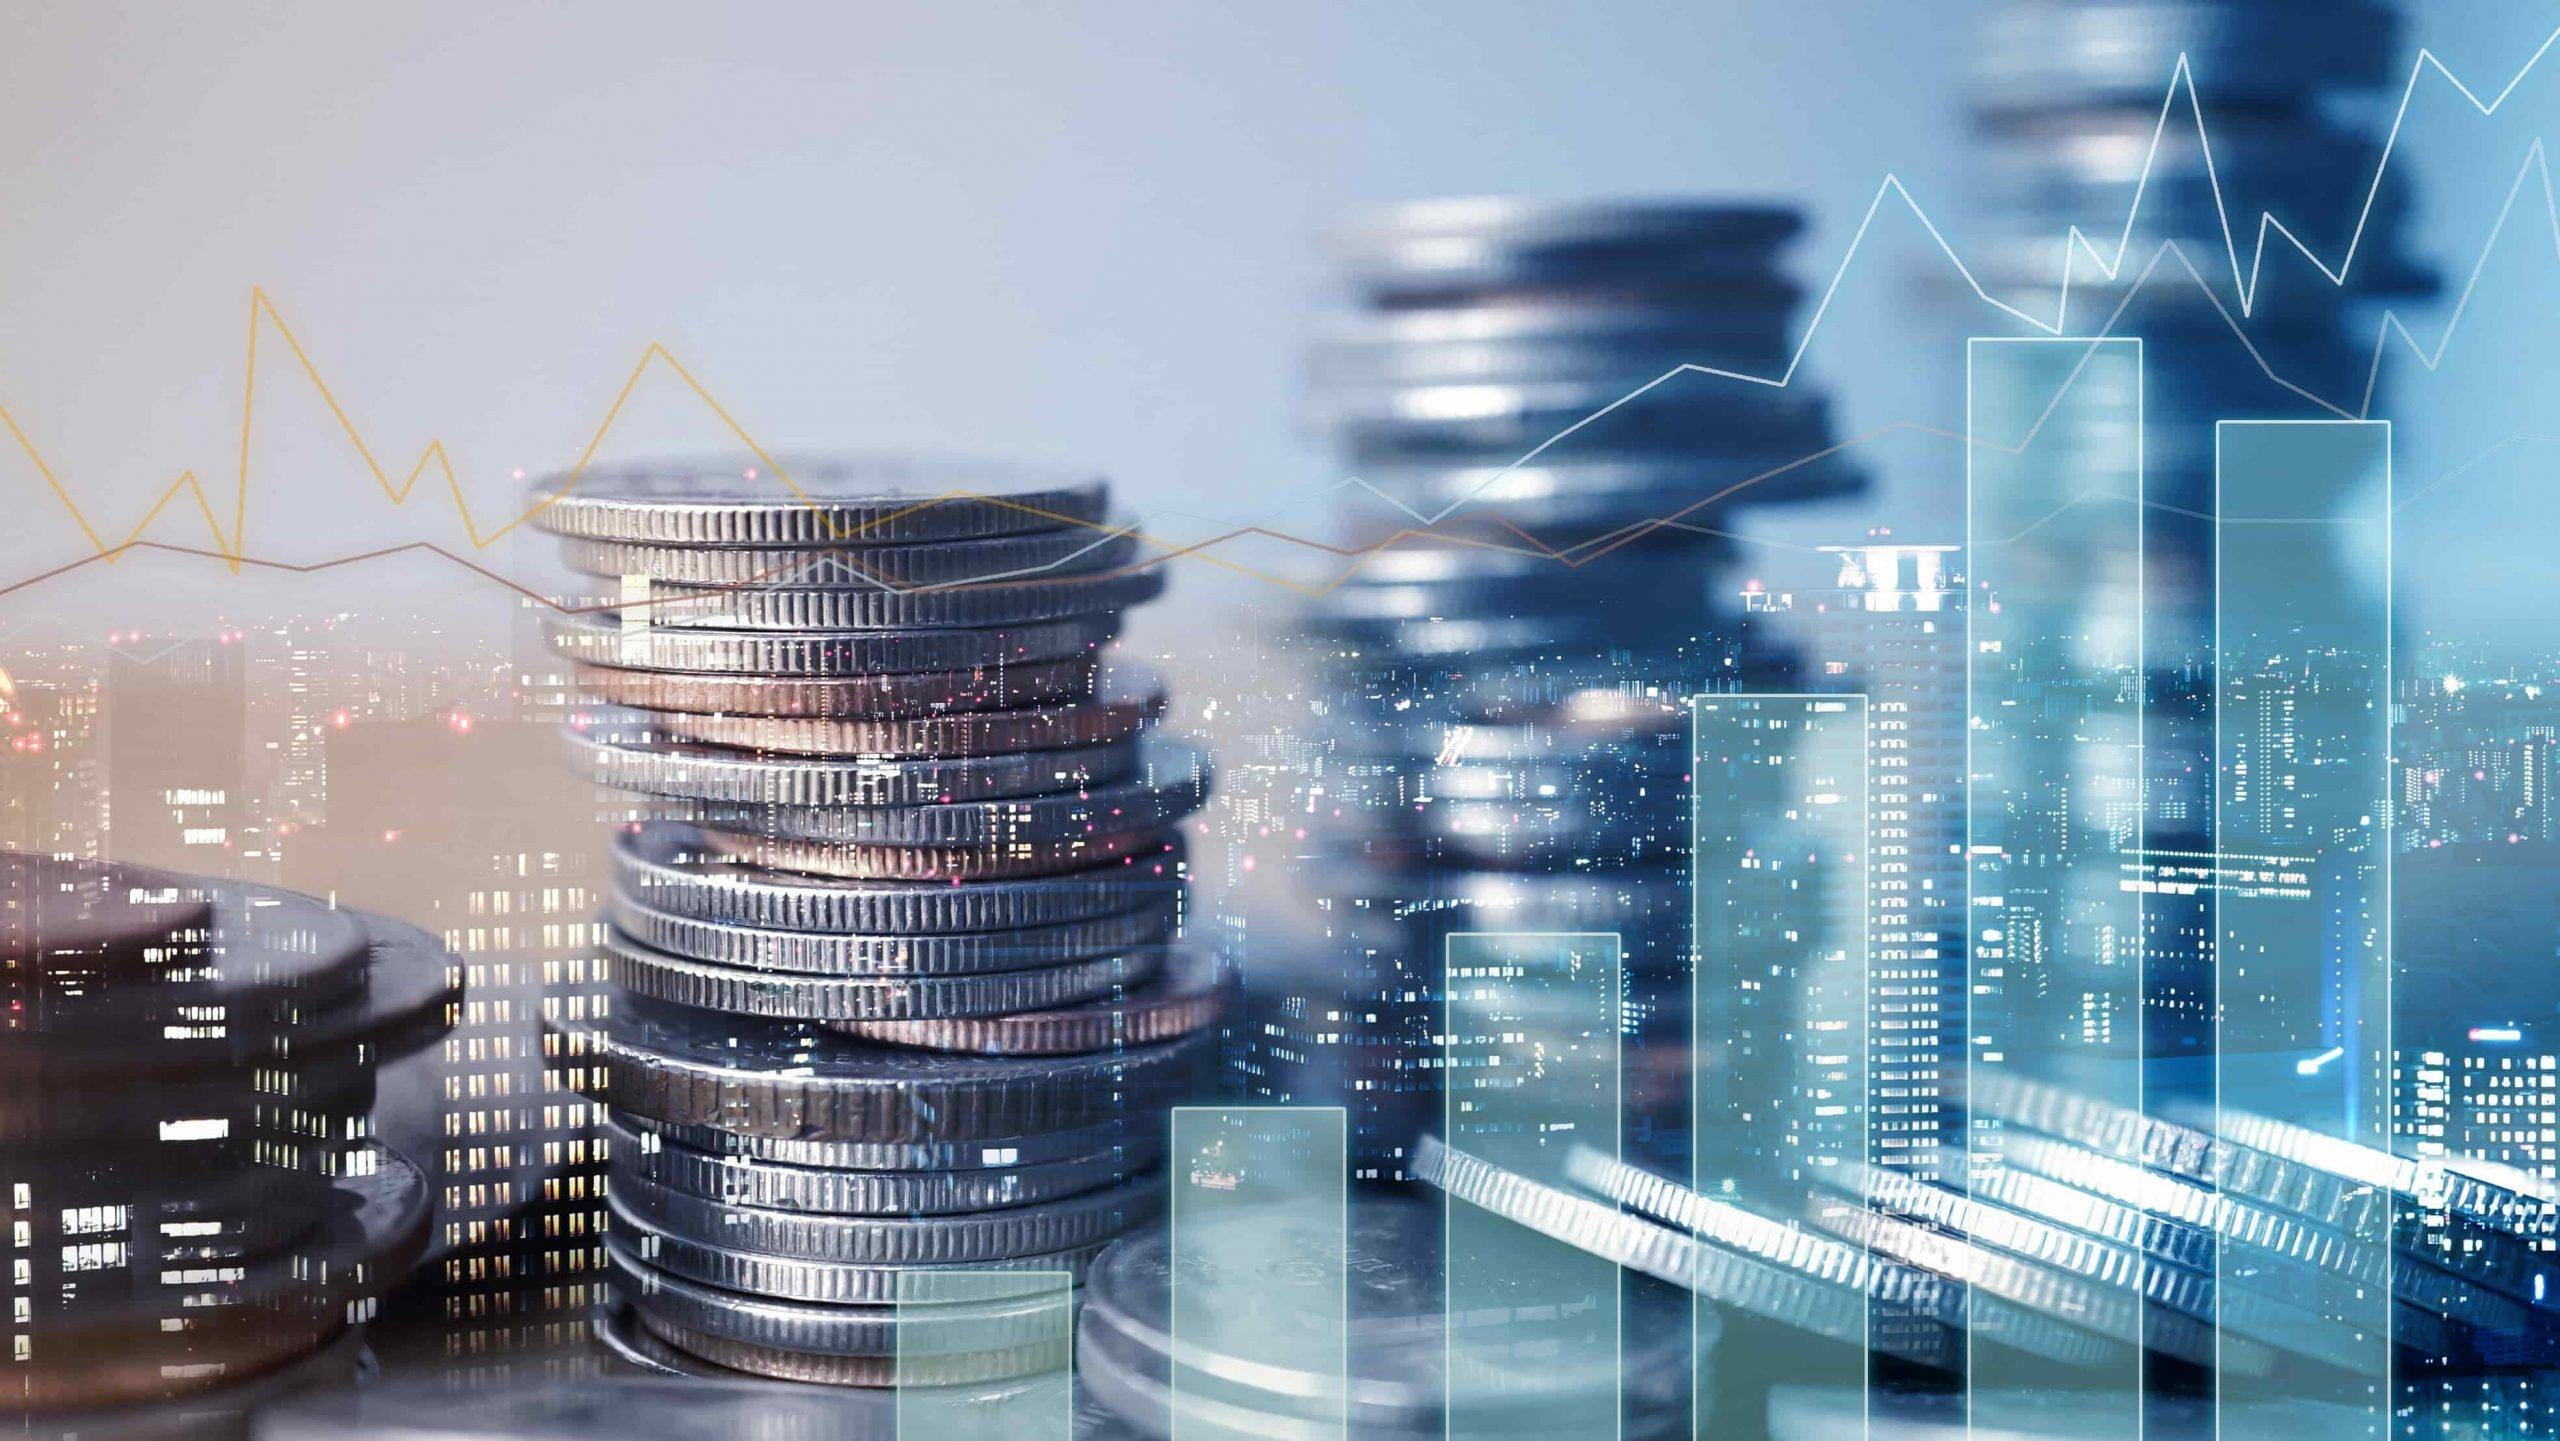 Financiamento empresarial - Entenda o que é e descubra o necessário para conseguir o seu! - Financiamento empresarial – Entenda o que é e descubra o necessário para conseguir o seu!